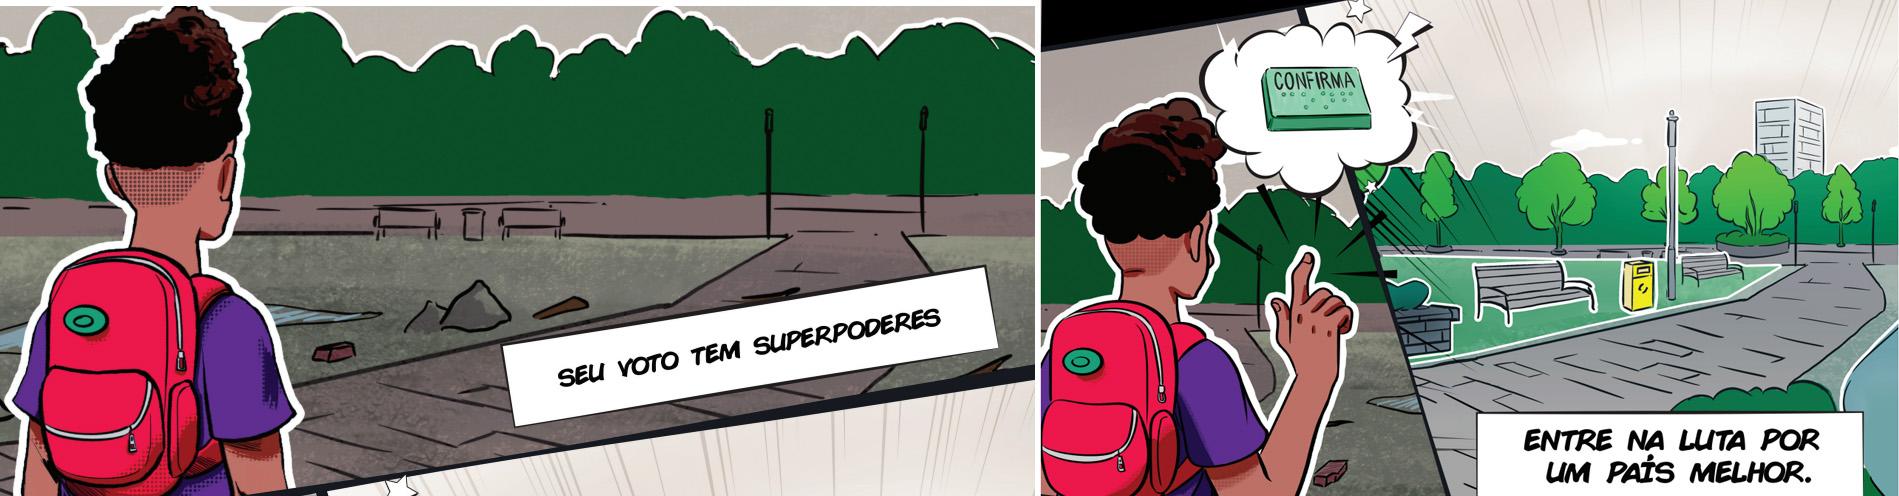 seu voto tem superpoderes